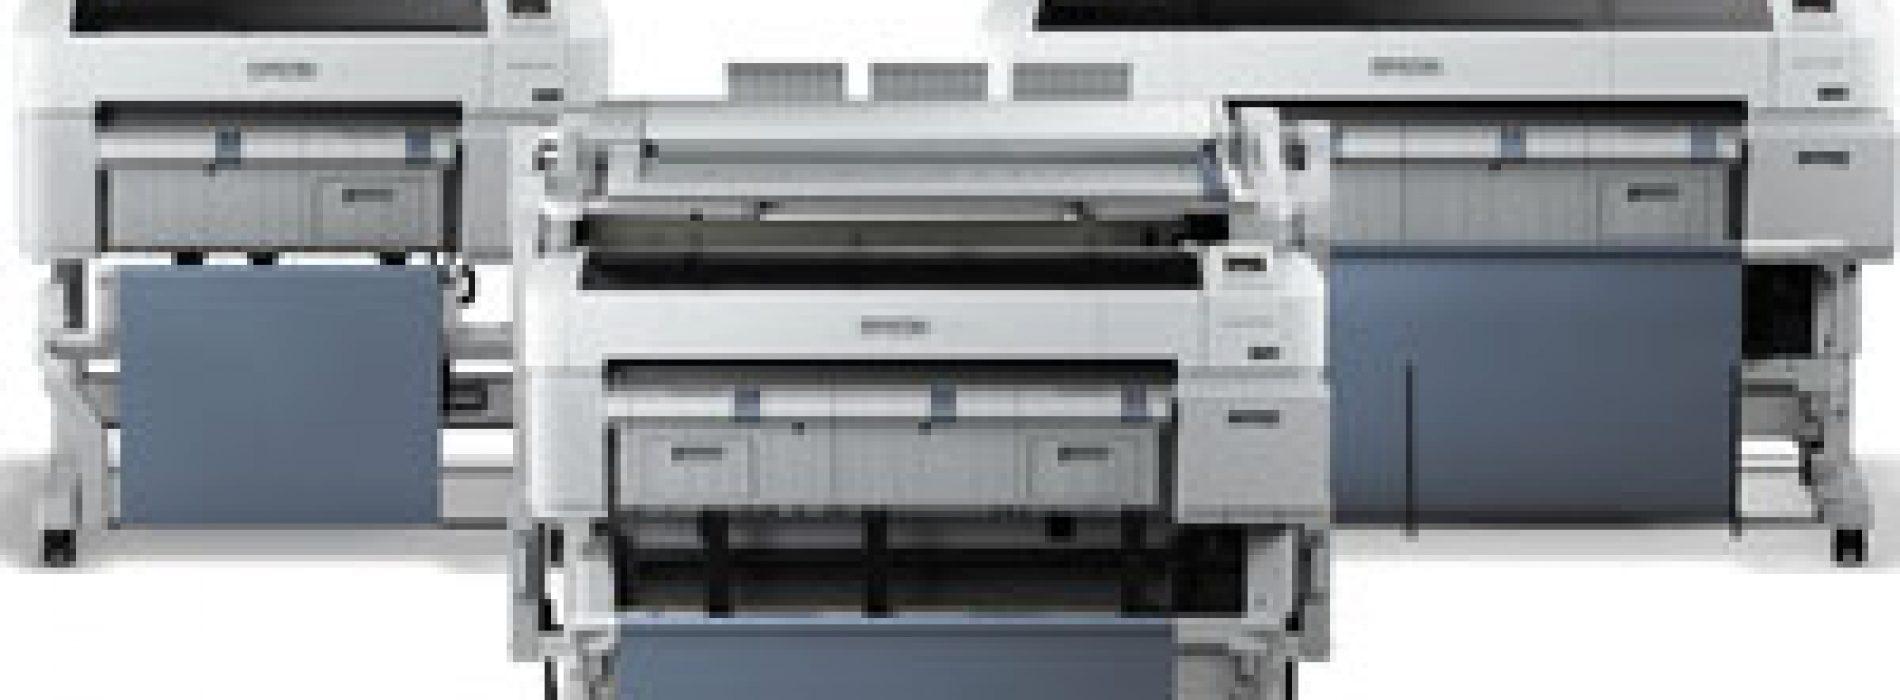 Presentan equipos de impresión por demanda